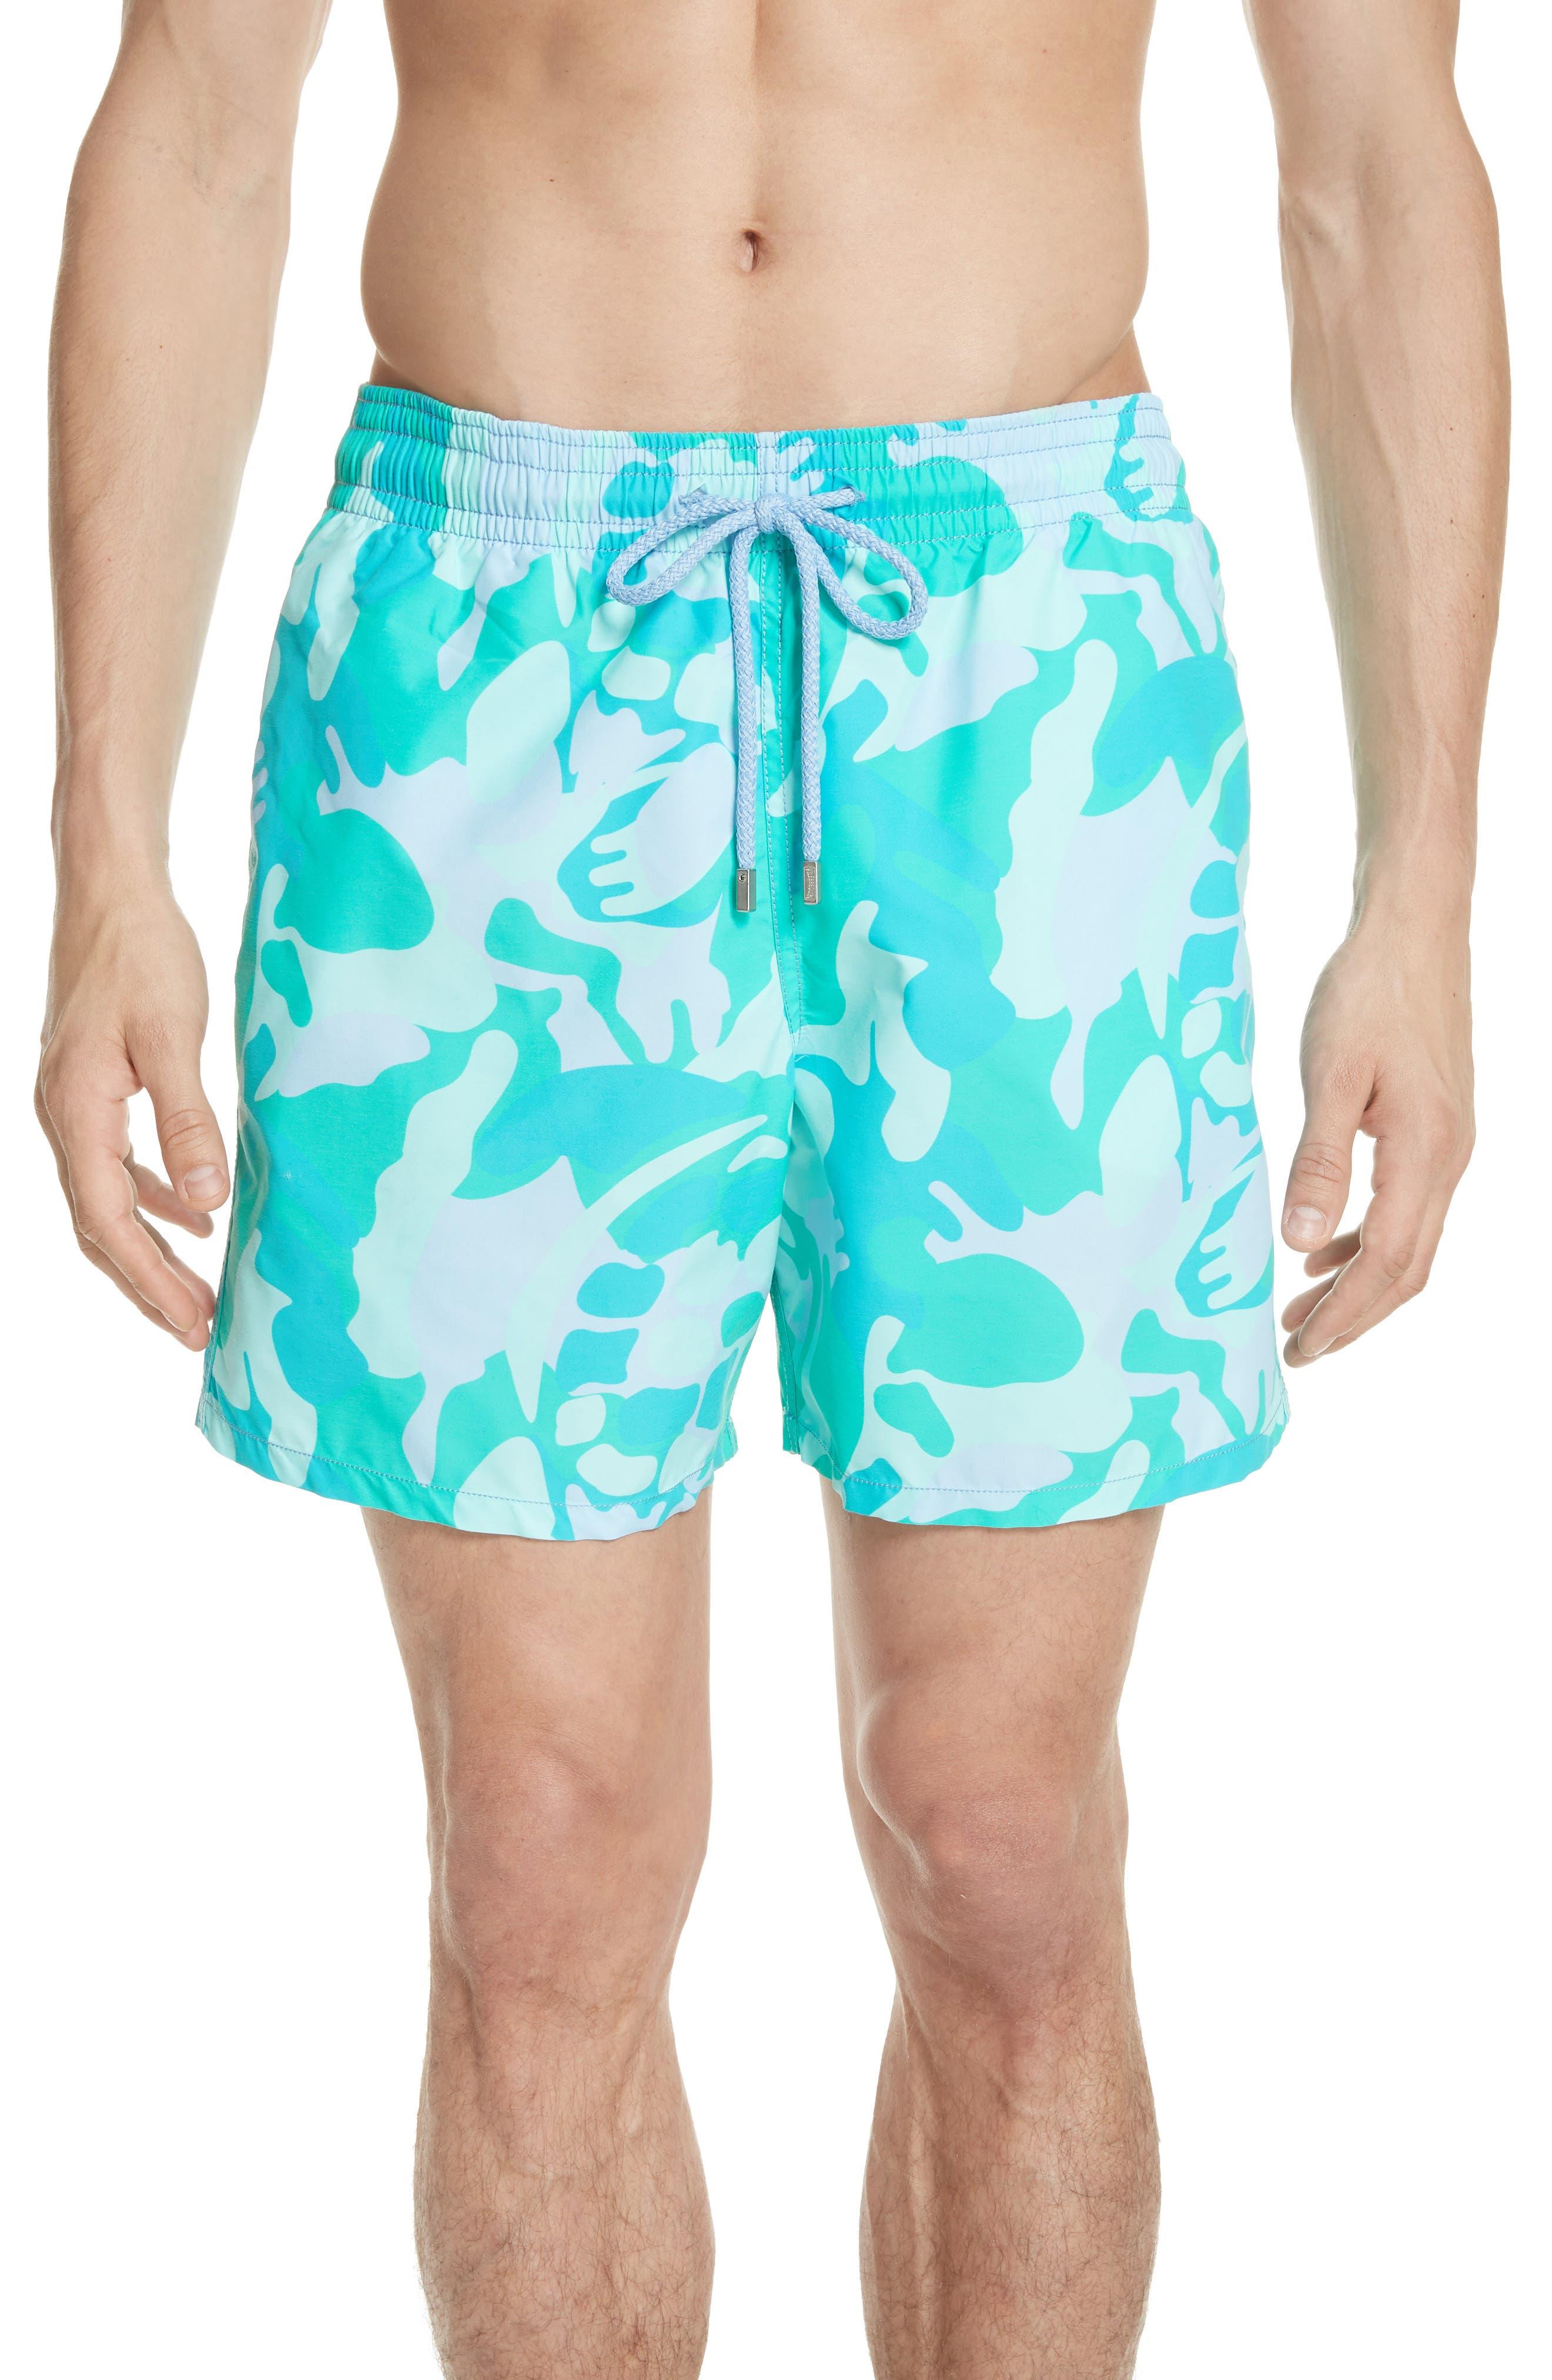 Camo Turtle Print Swim Trunks,                         Main,                         color, Sky Blue